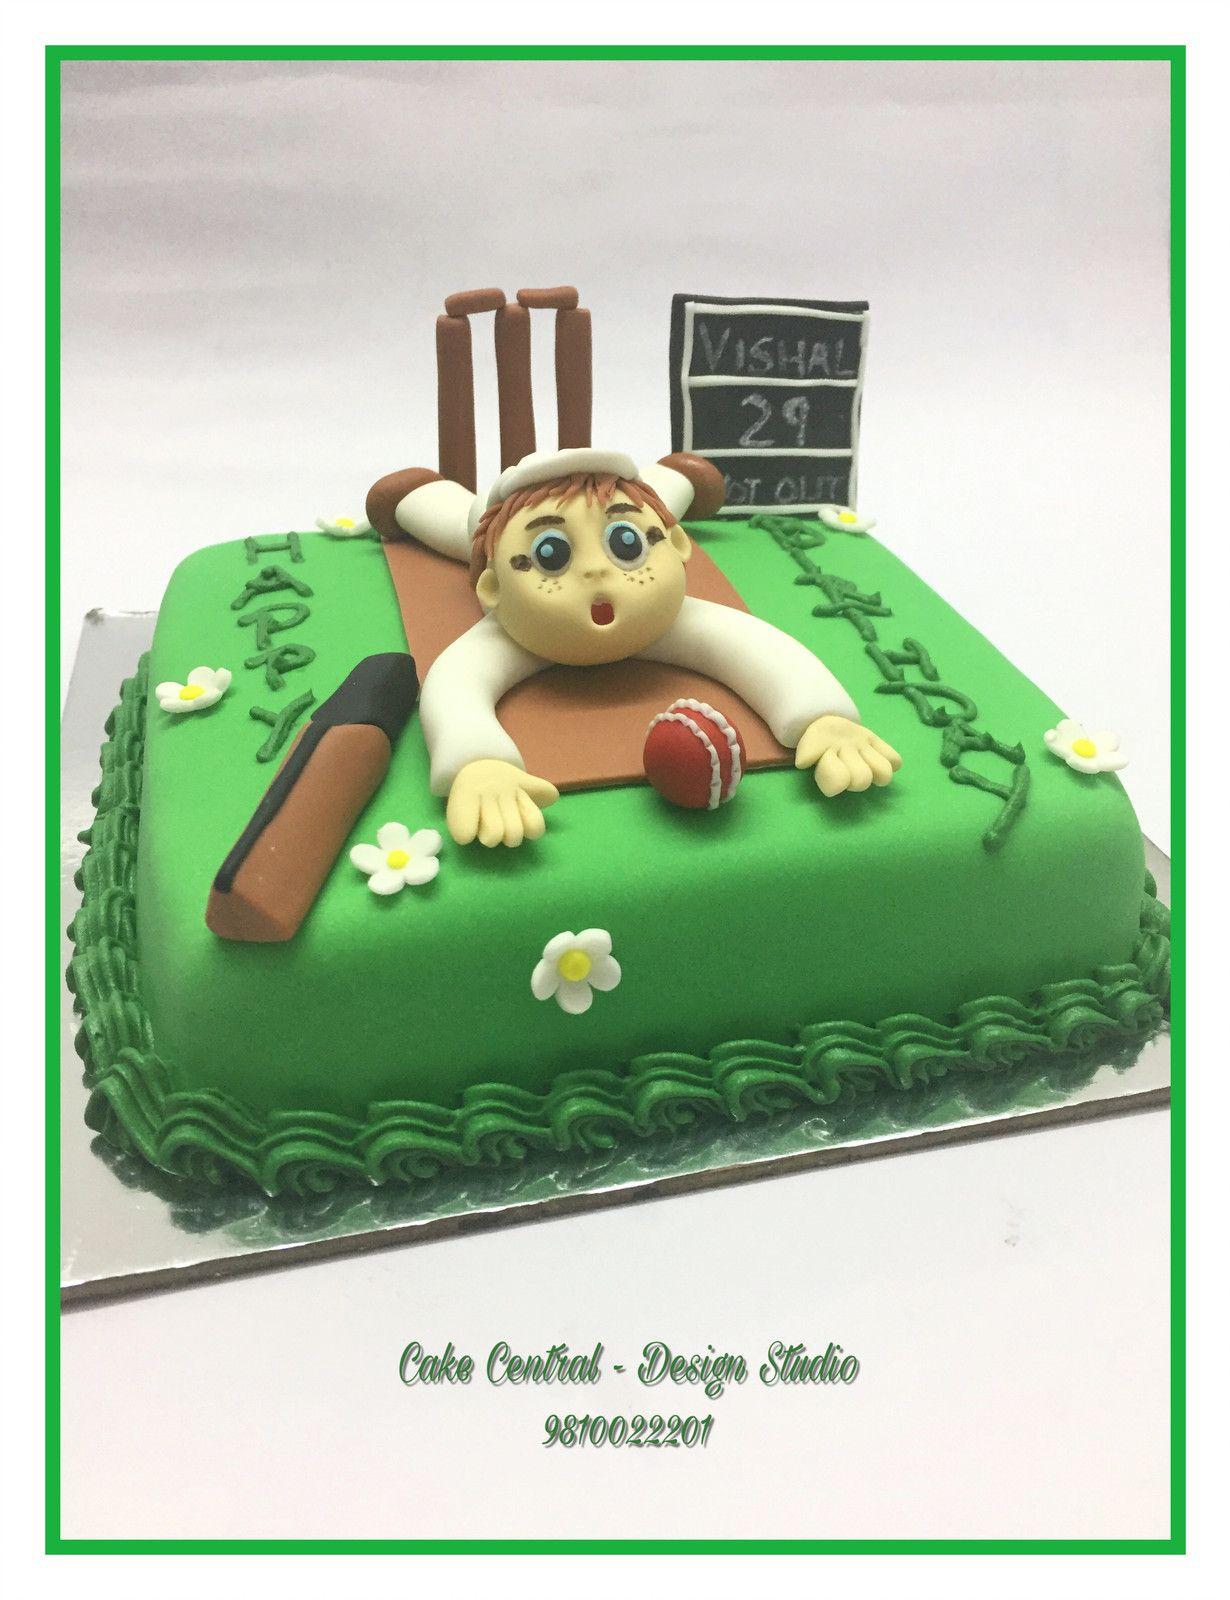 Cricket Themed Birthday Cake with Birthday Boys Figurine ...